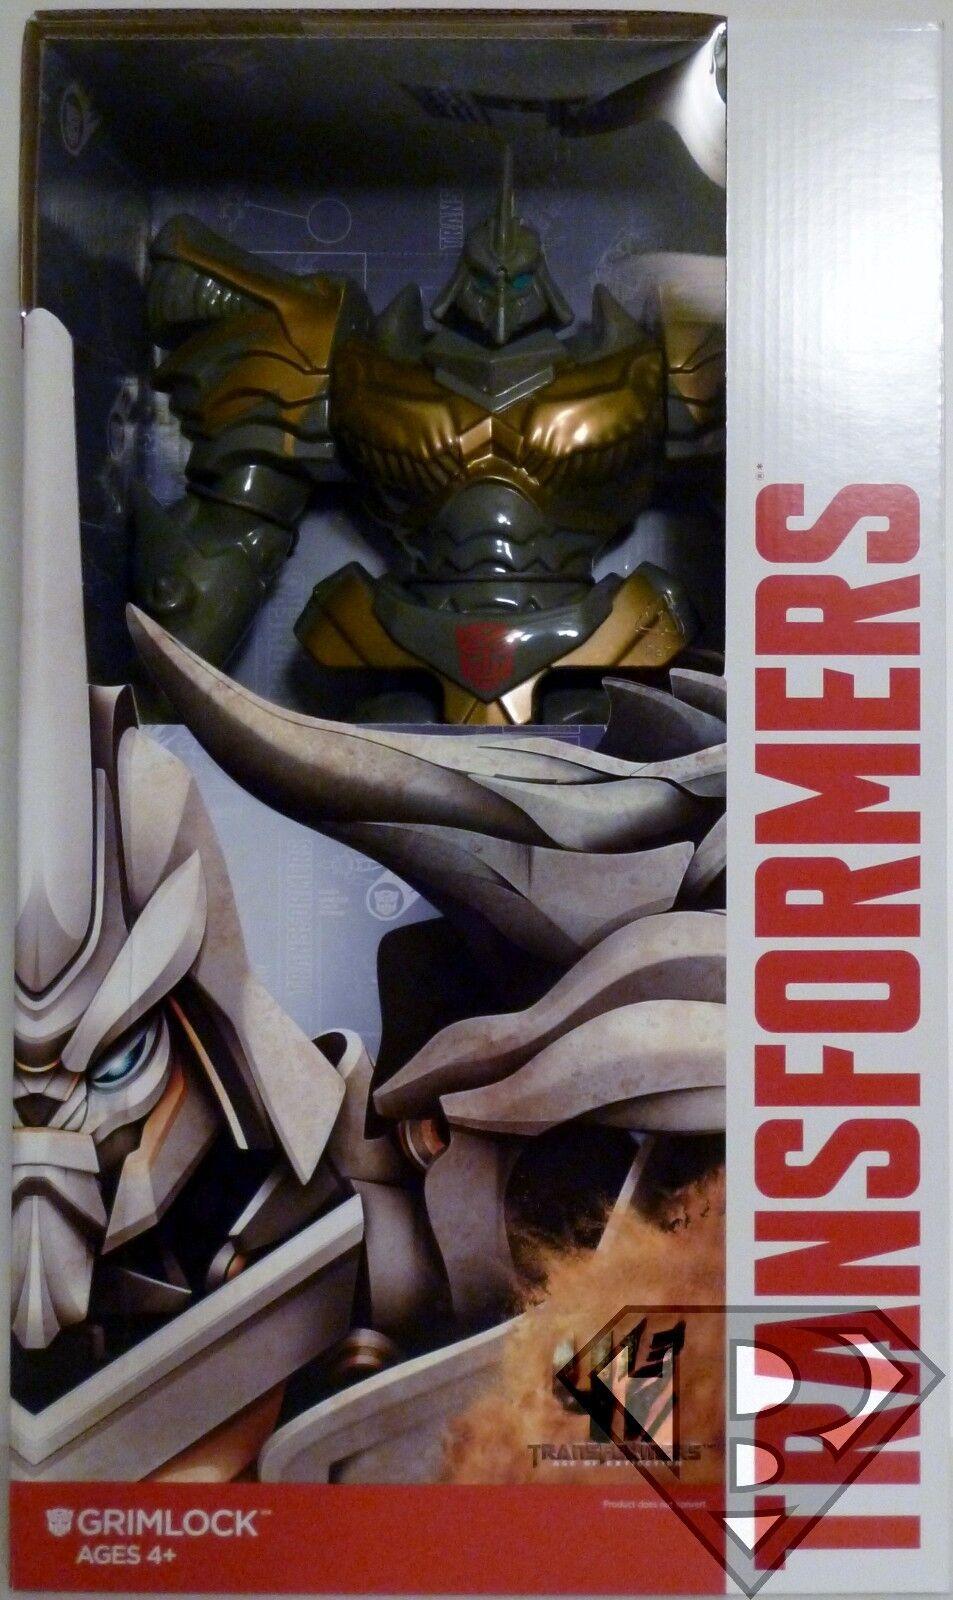 HASBRO b4679-TRANSFORMERS combiner Force-TITANIO Guardians-Grimlock Nuovo//Scatola Originale